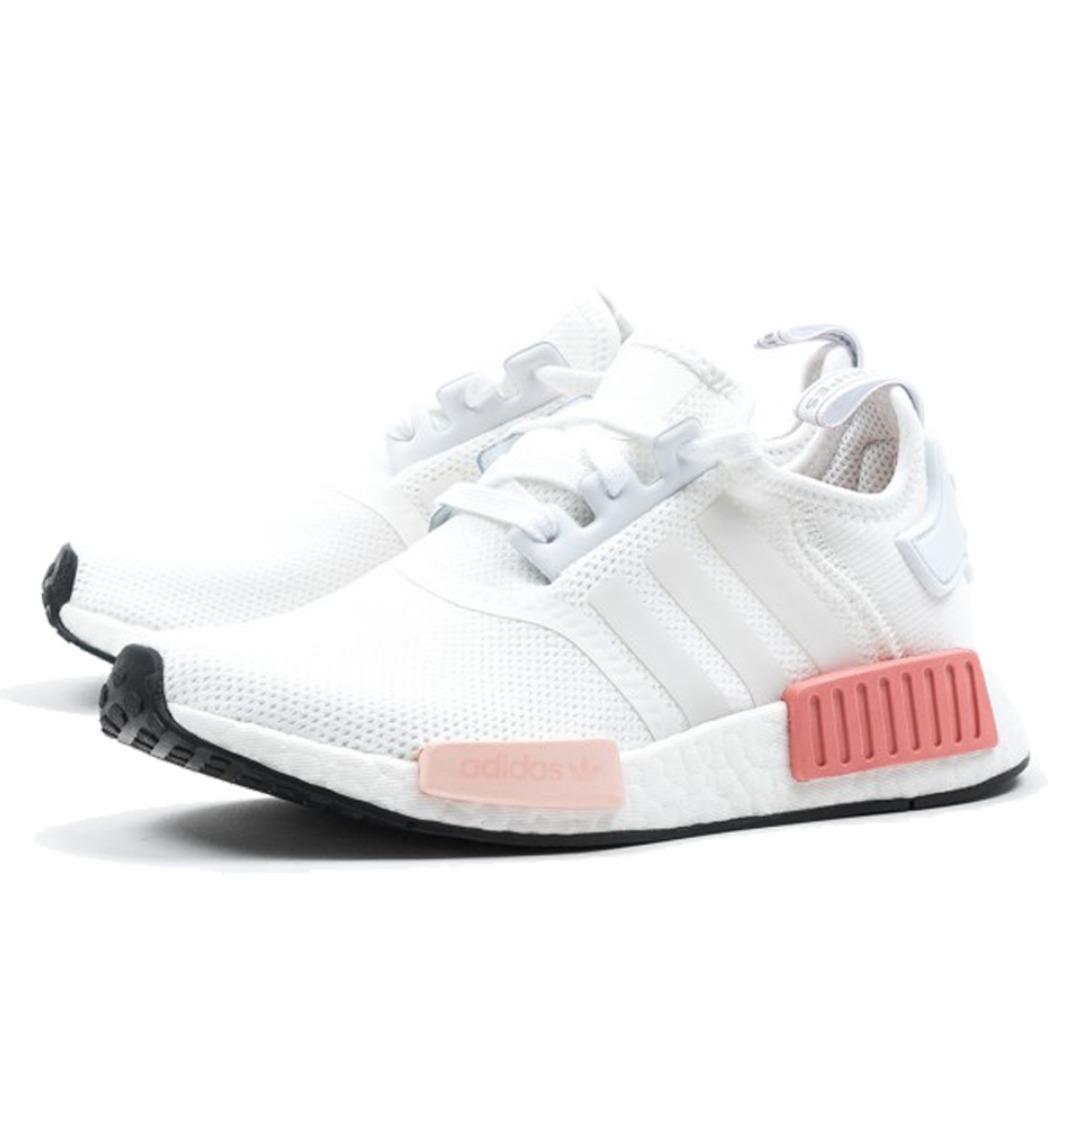 84cf6ea7e8e ... blanco rosa by9952 2f24a e7eec  official store zapatillas adidas nmd  runner mujer original lo más buscado cargando zoom. 22a17 b0f63